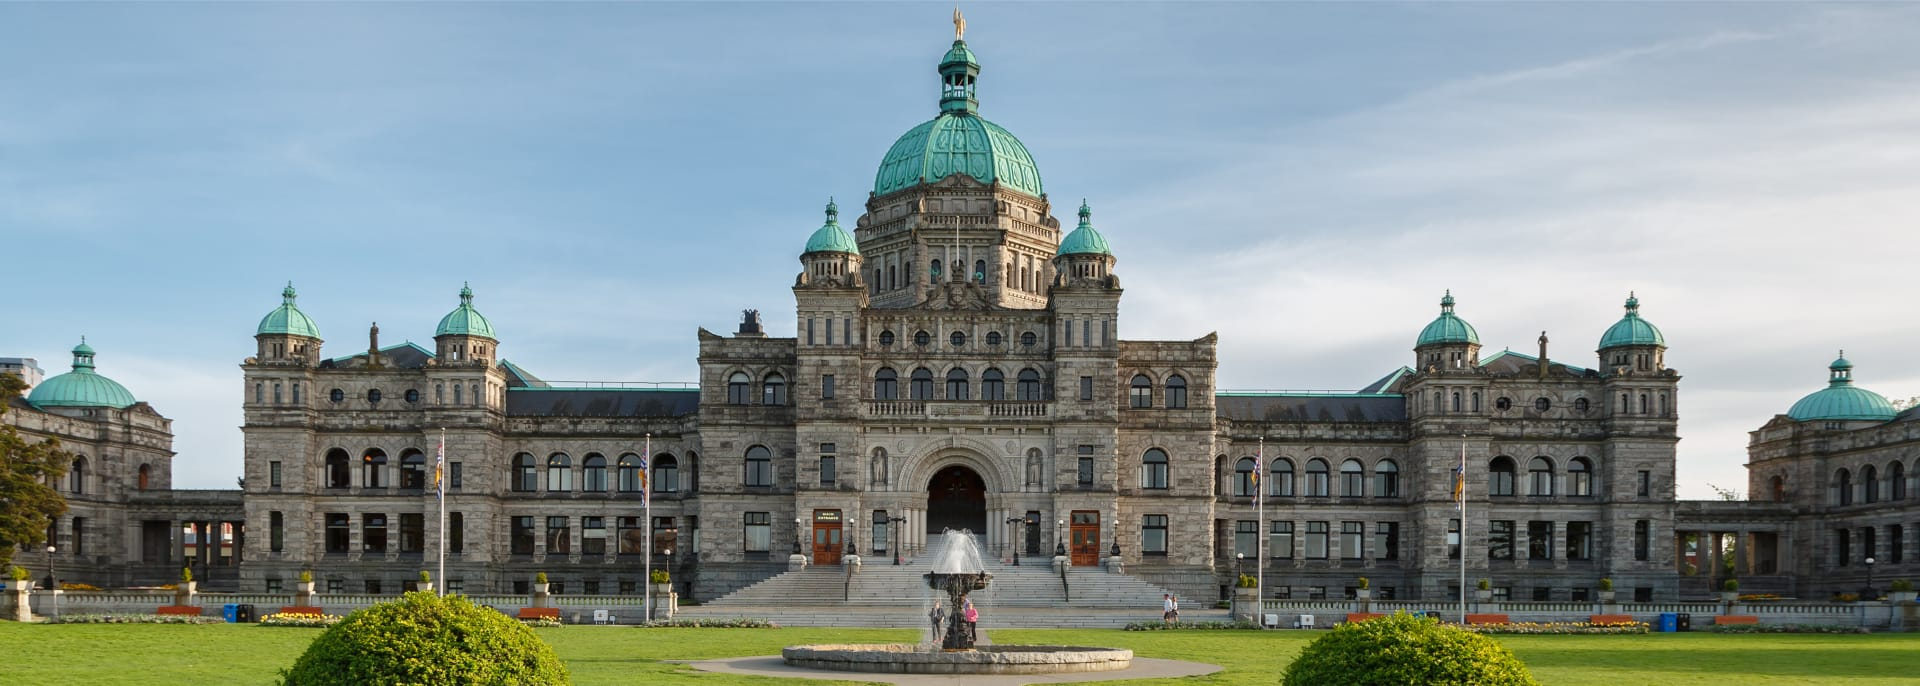 Government Building at Victoria Canada